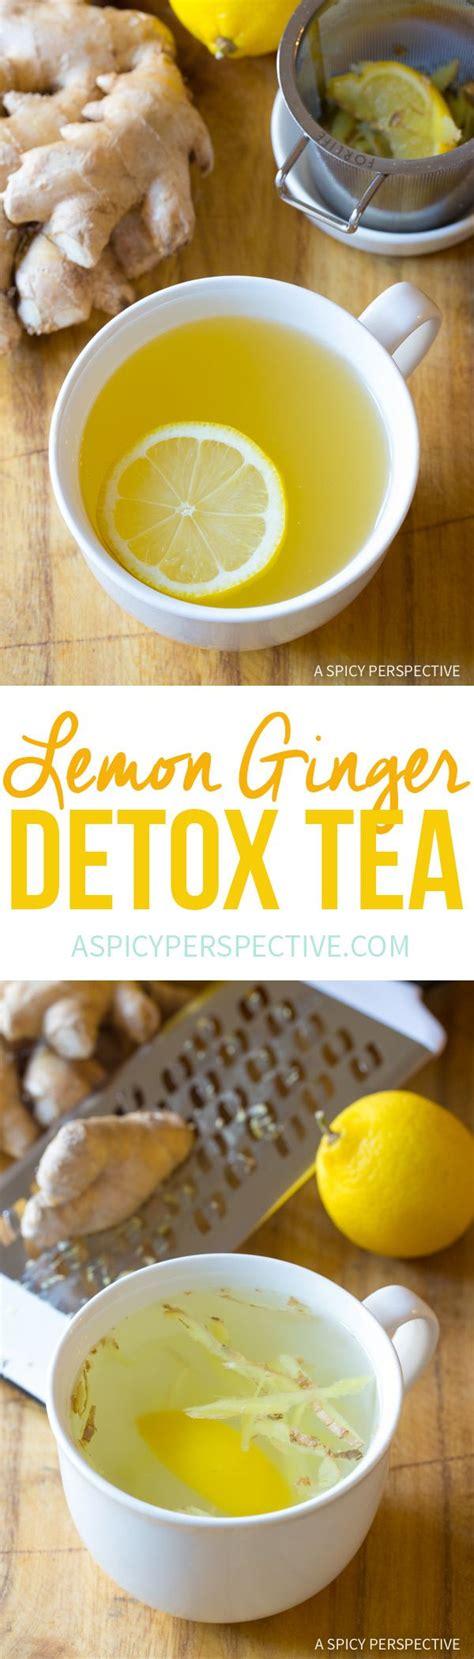 Lemon Detox Ingredients Australia by Lemon Detox Tea Recipe The O Jays Detox And Teas